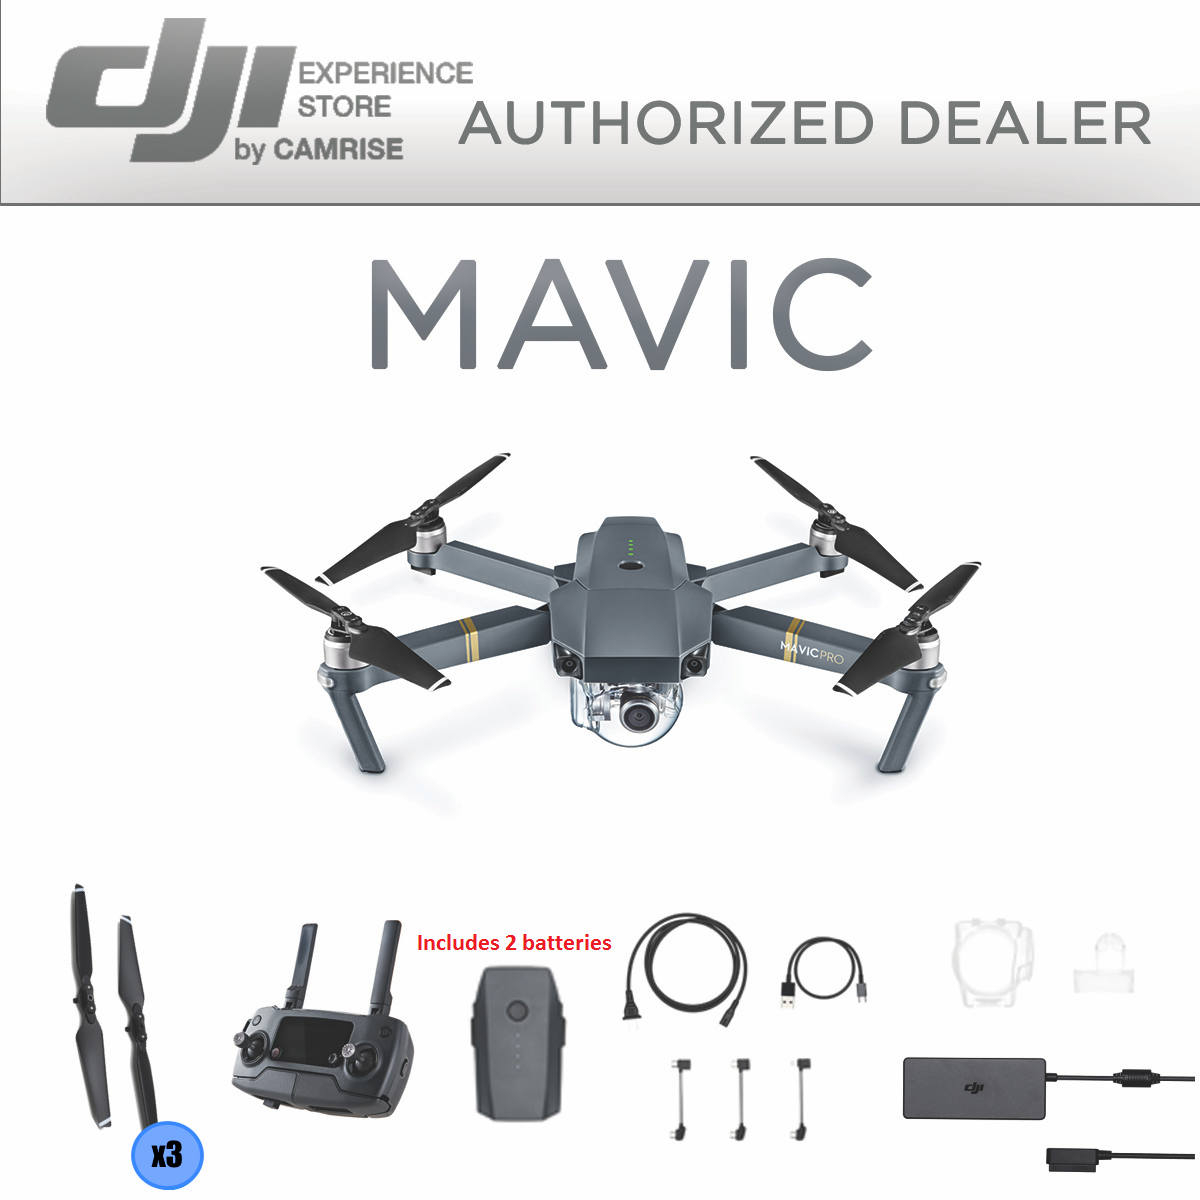 DJI Mavic Pro Drone  4K Stabilized Camera includes 2 batteries, New!